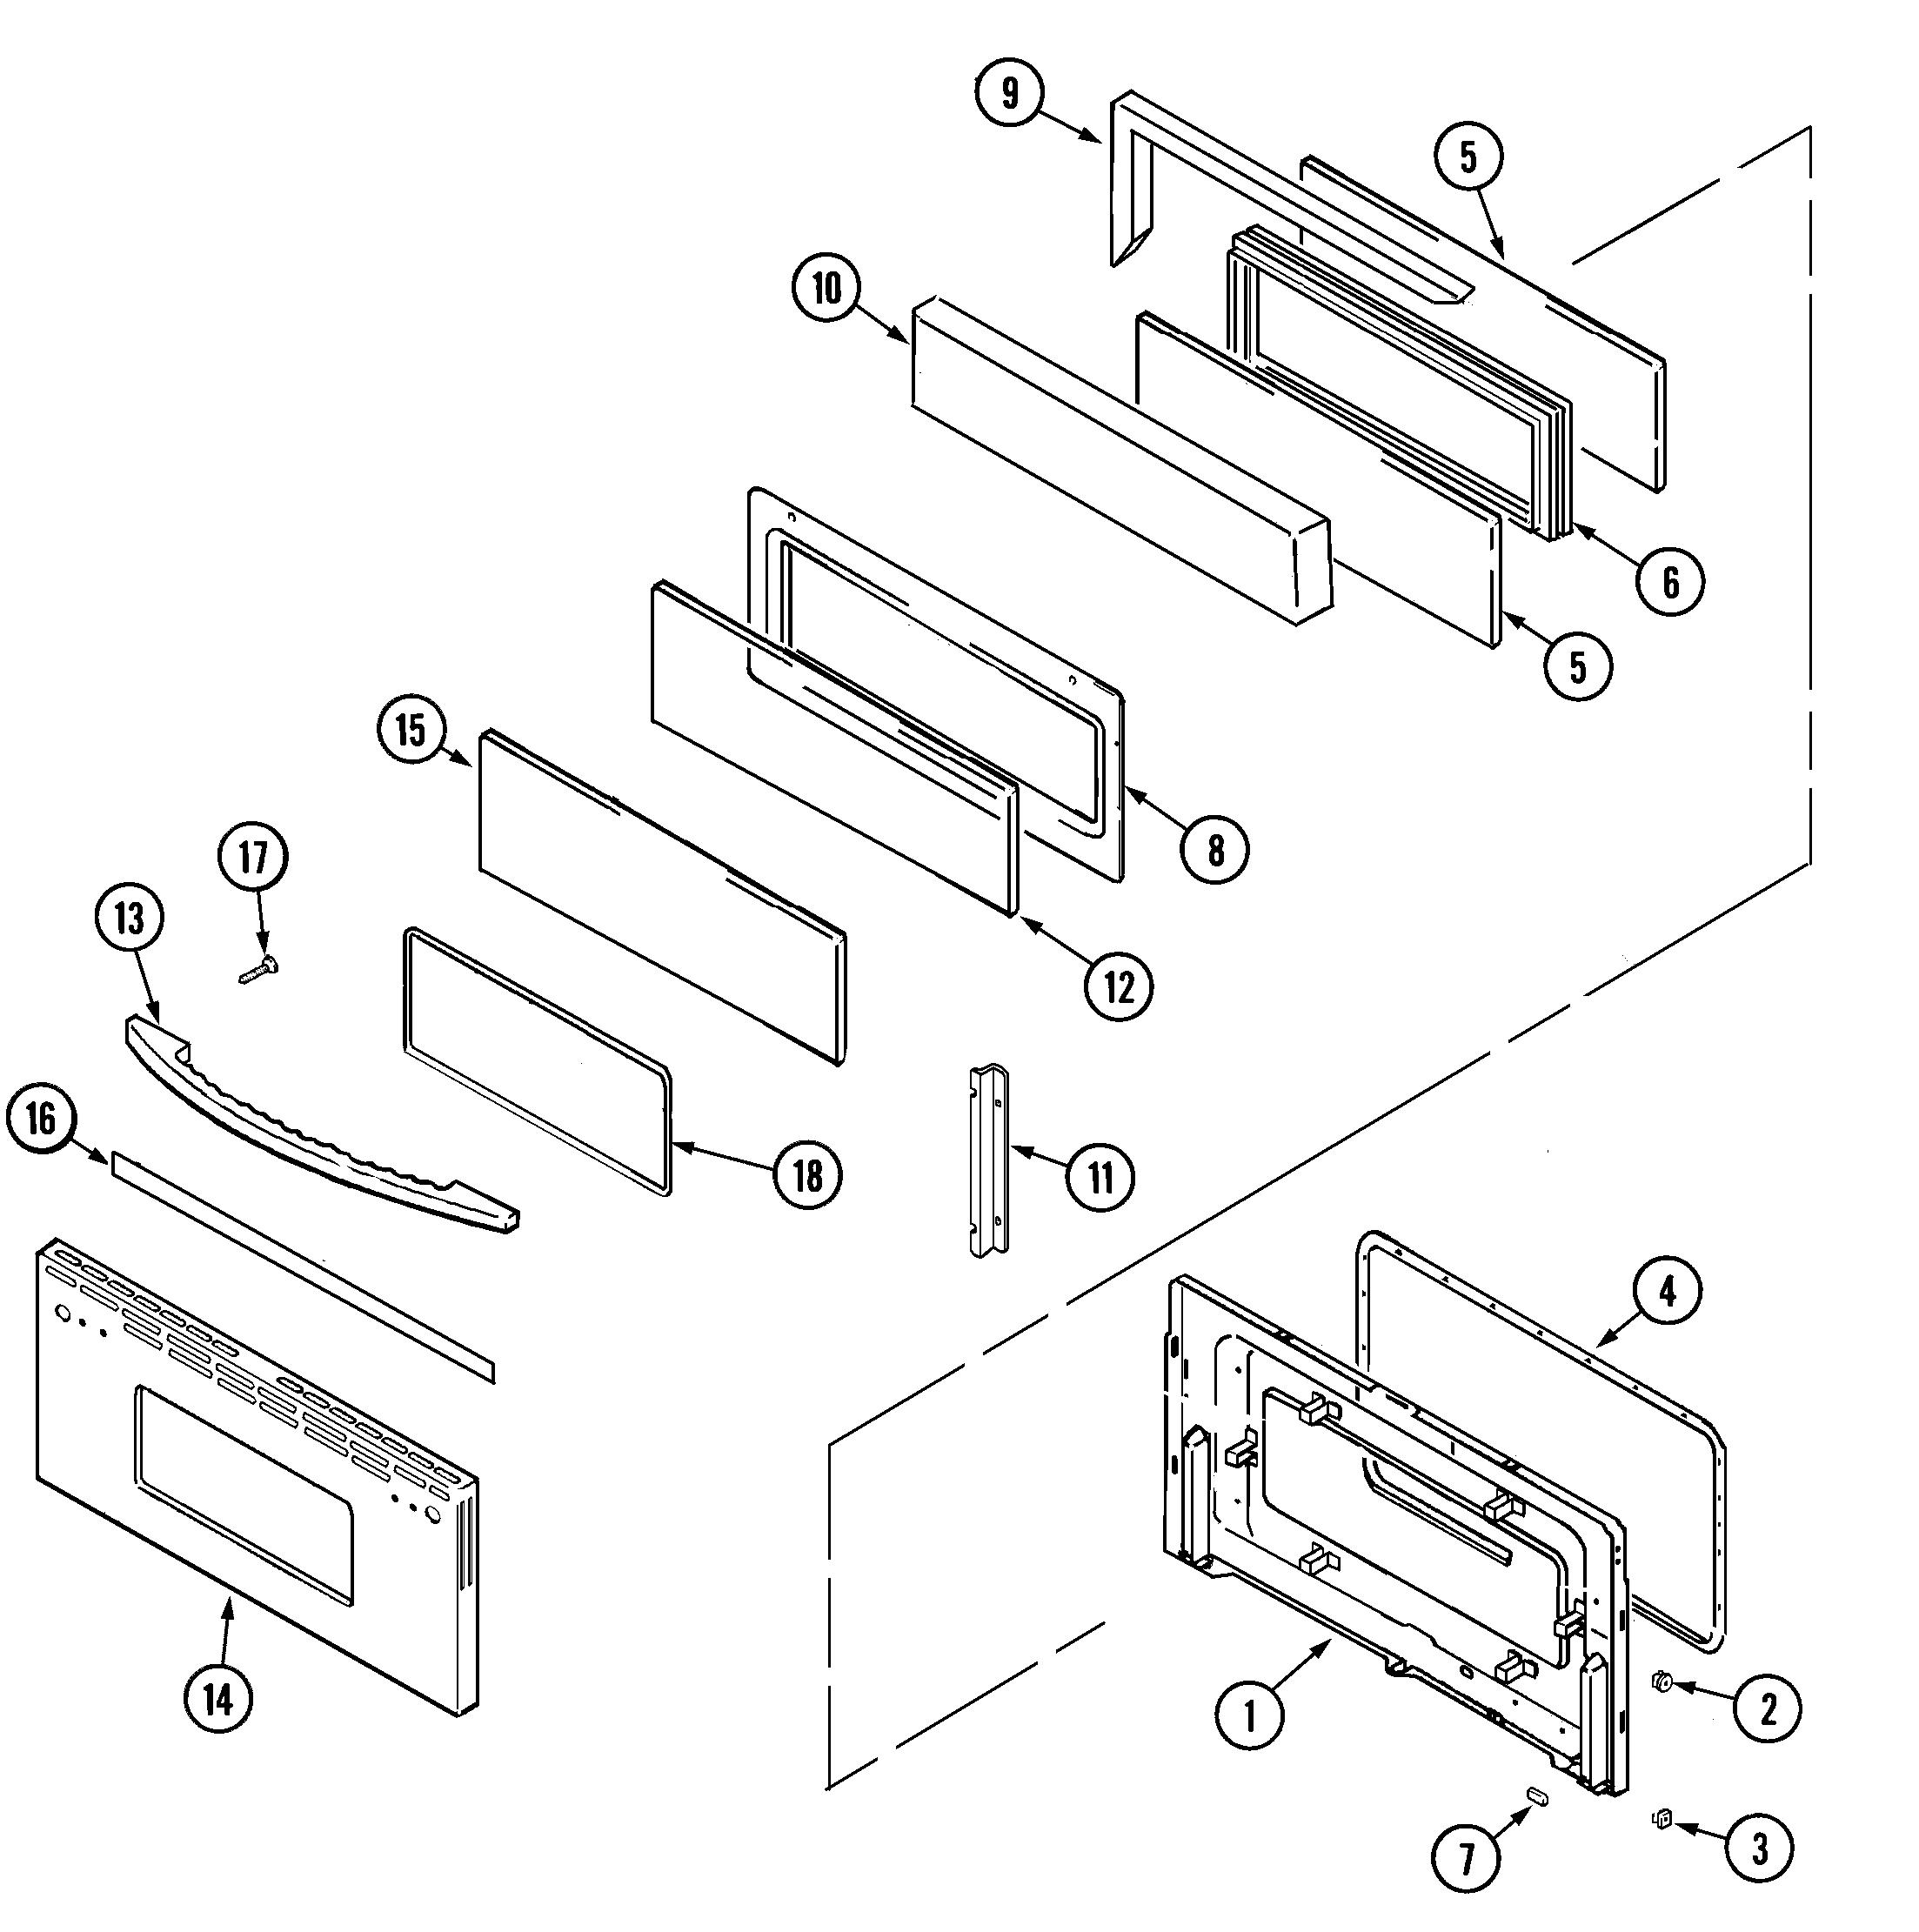 Door Upper Bac Bas Parts on York Timer Wiring